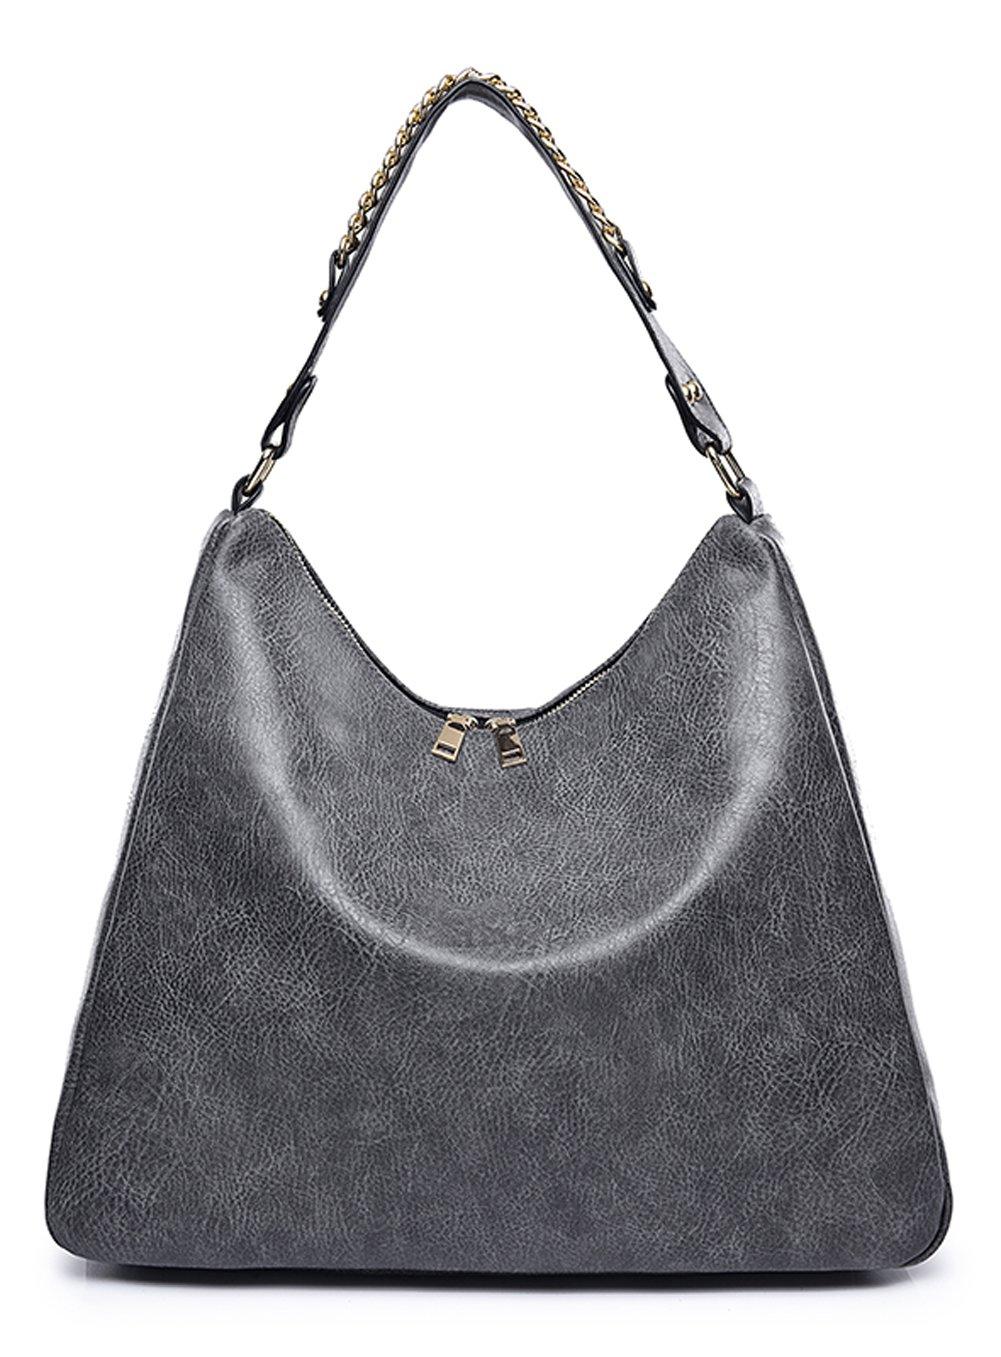 Covelin Women's Soft Leather Handbag Hobo Purse Large Capacity Tote Shoulder Bag Grey